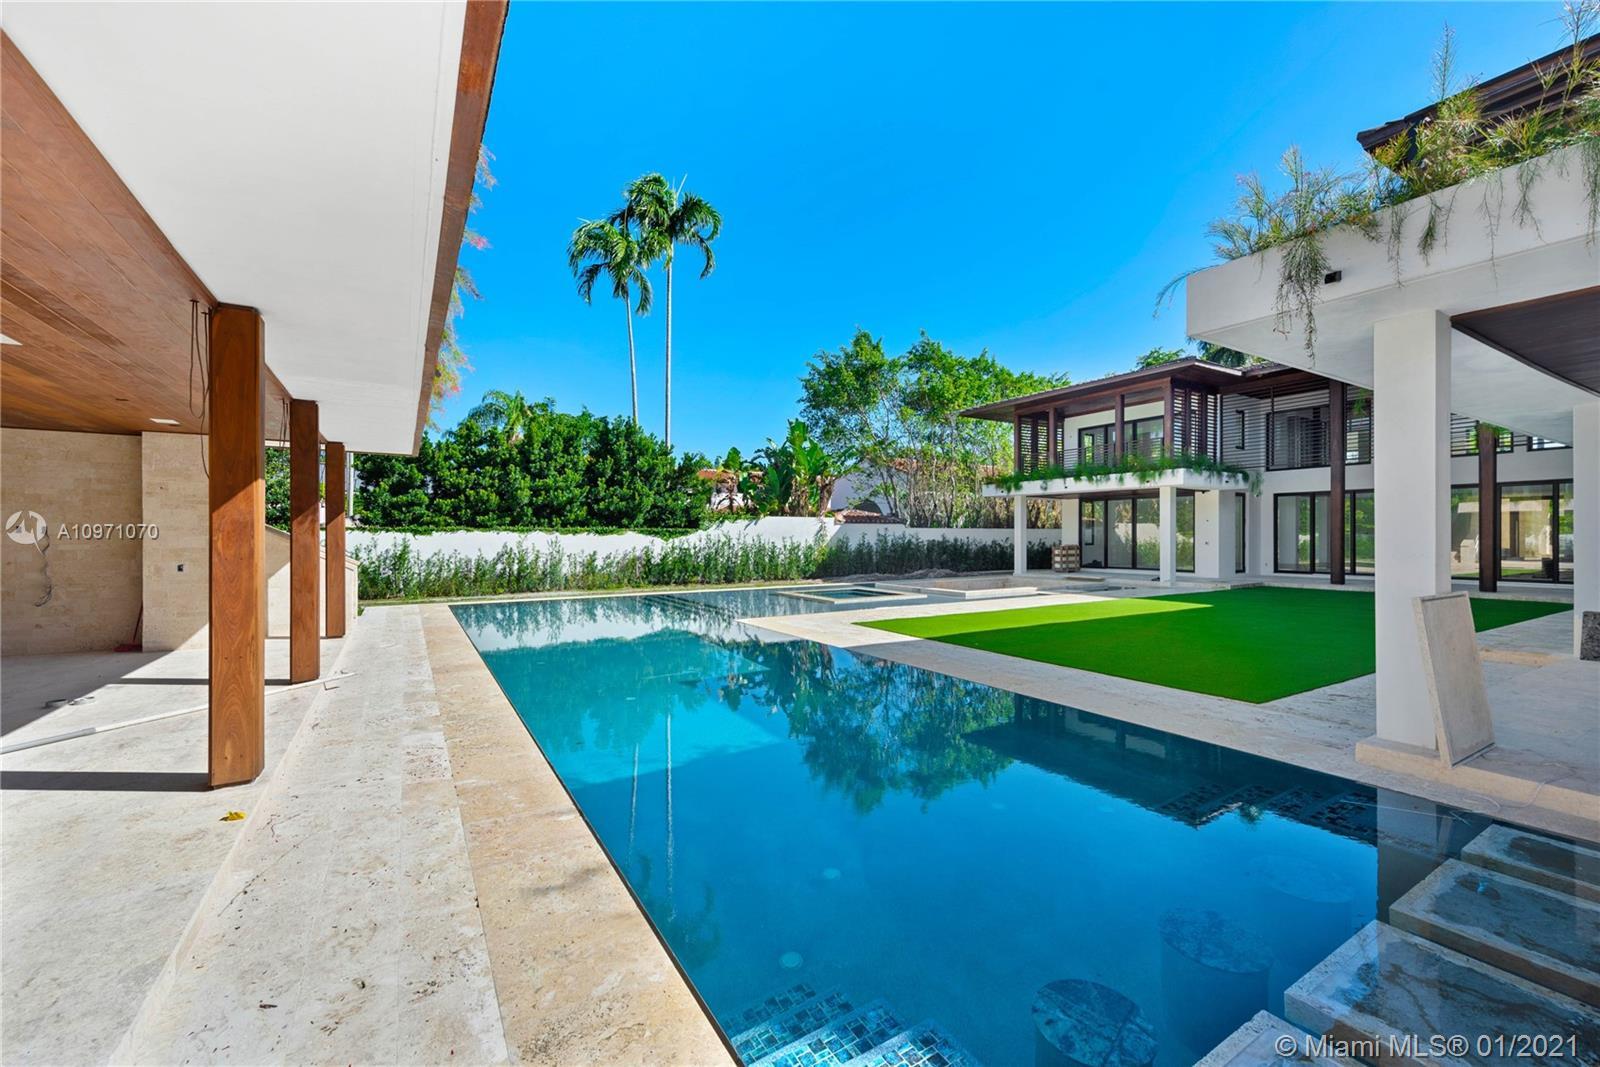 1899 S Bayshore Dr, Miami, Florida 33133, 8 Bedrooms Bedrooms, ,10 BathroomsBathrooms,Residential,For Sale,1899 S Bayshore Dr,A10971070